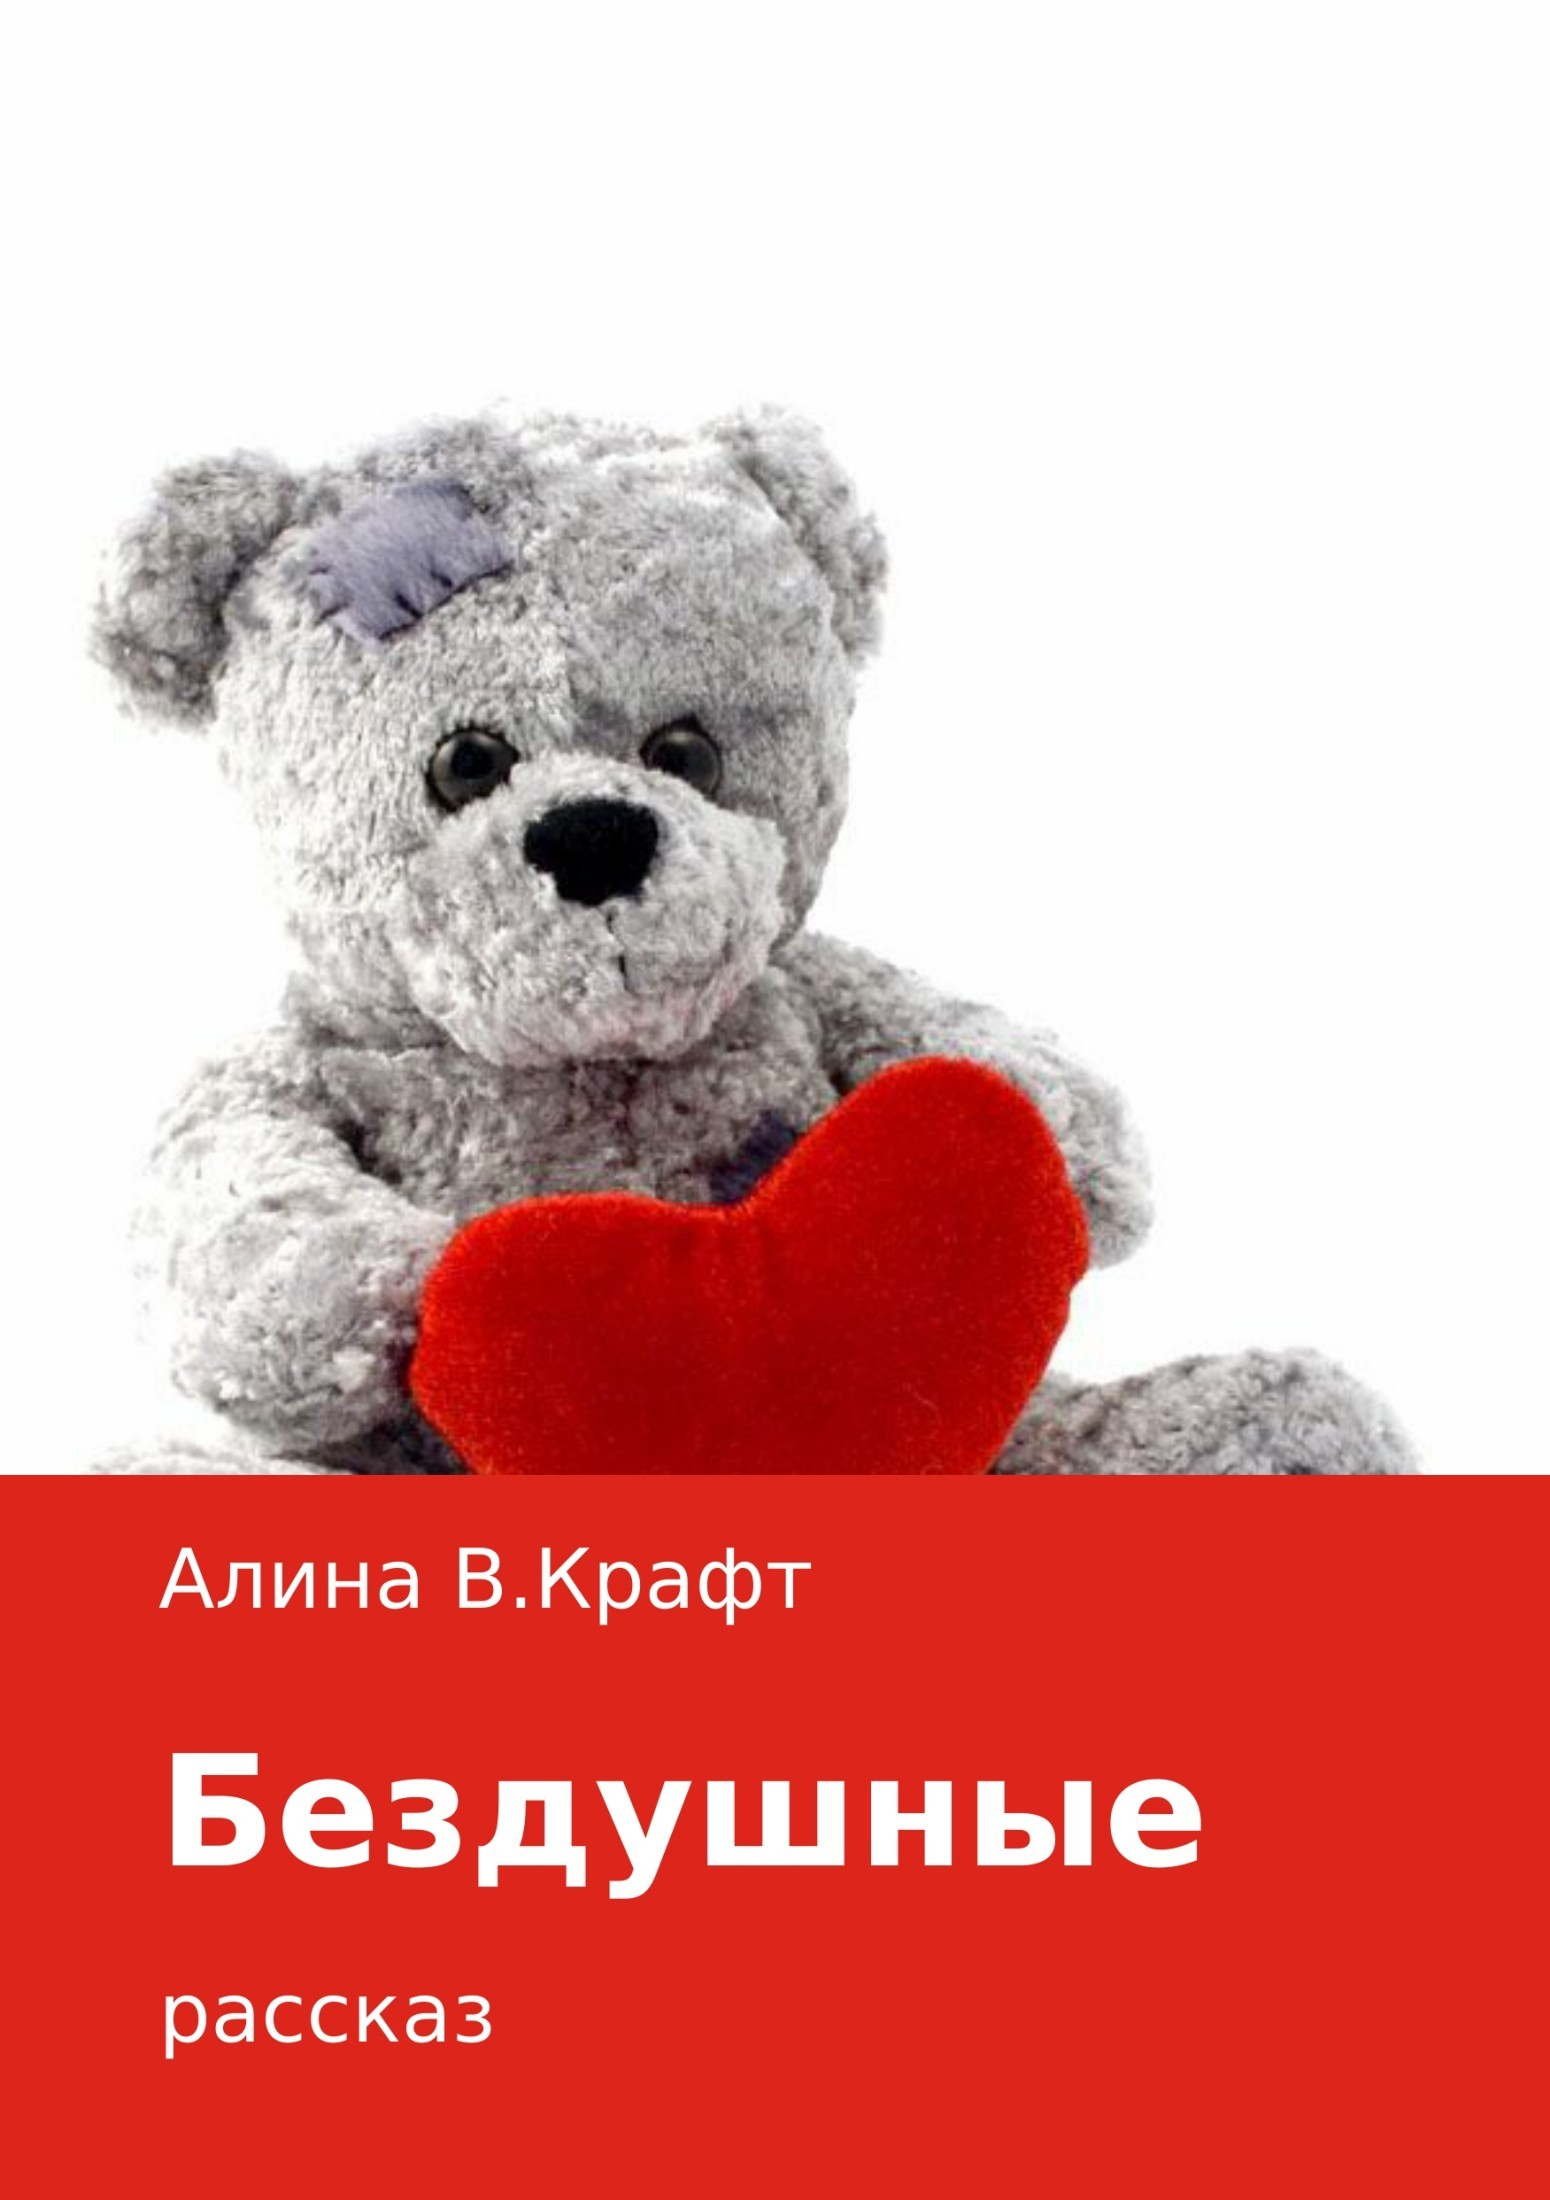 Алина В. Крафт Бездушные